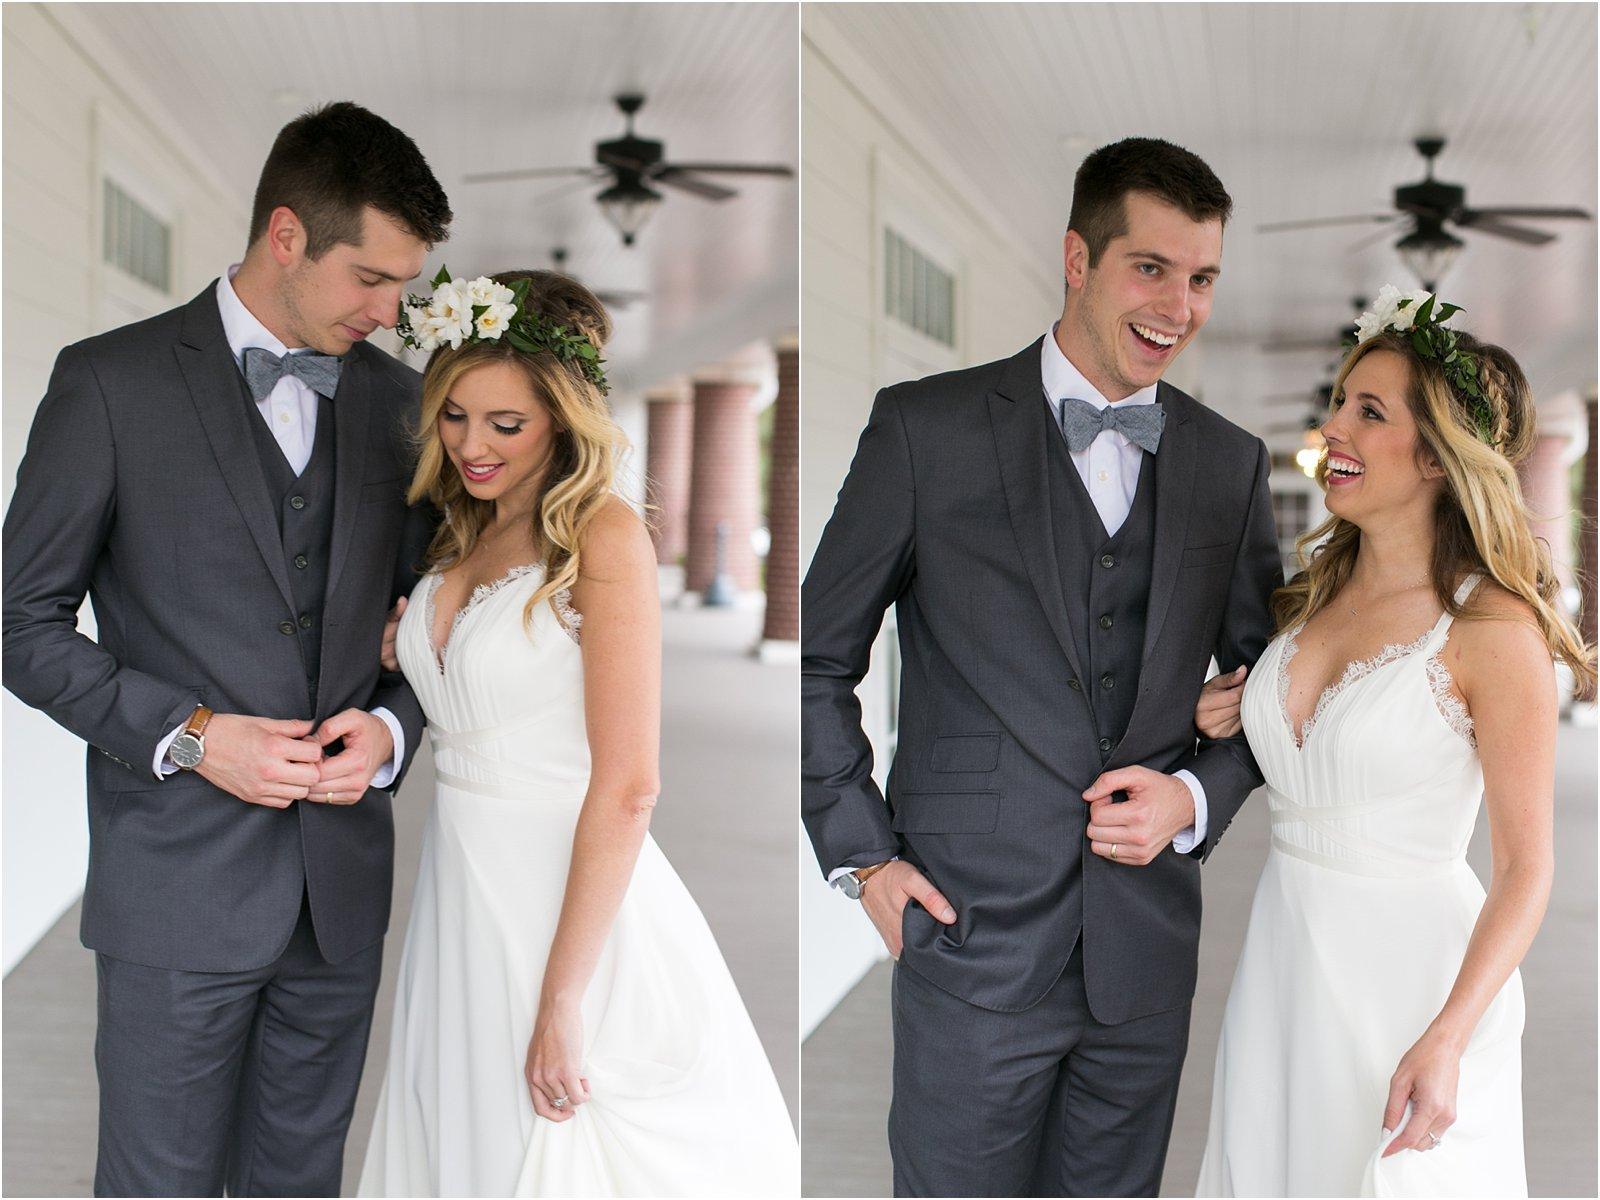 jessica_ryan_photography_womans_club_of_portsmouth_wedding_walk_through_a_wedding_bride_and_groom_0198